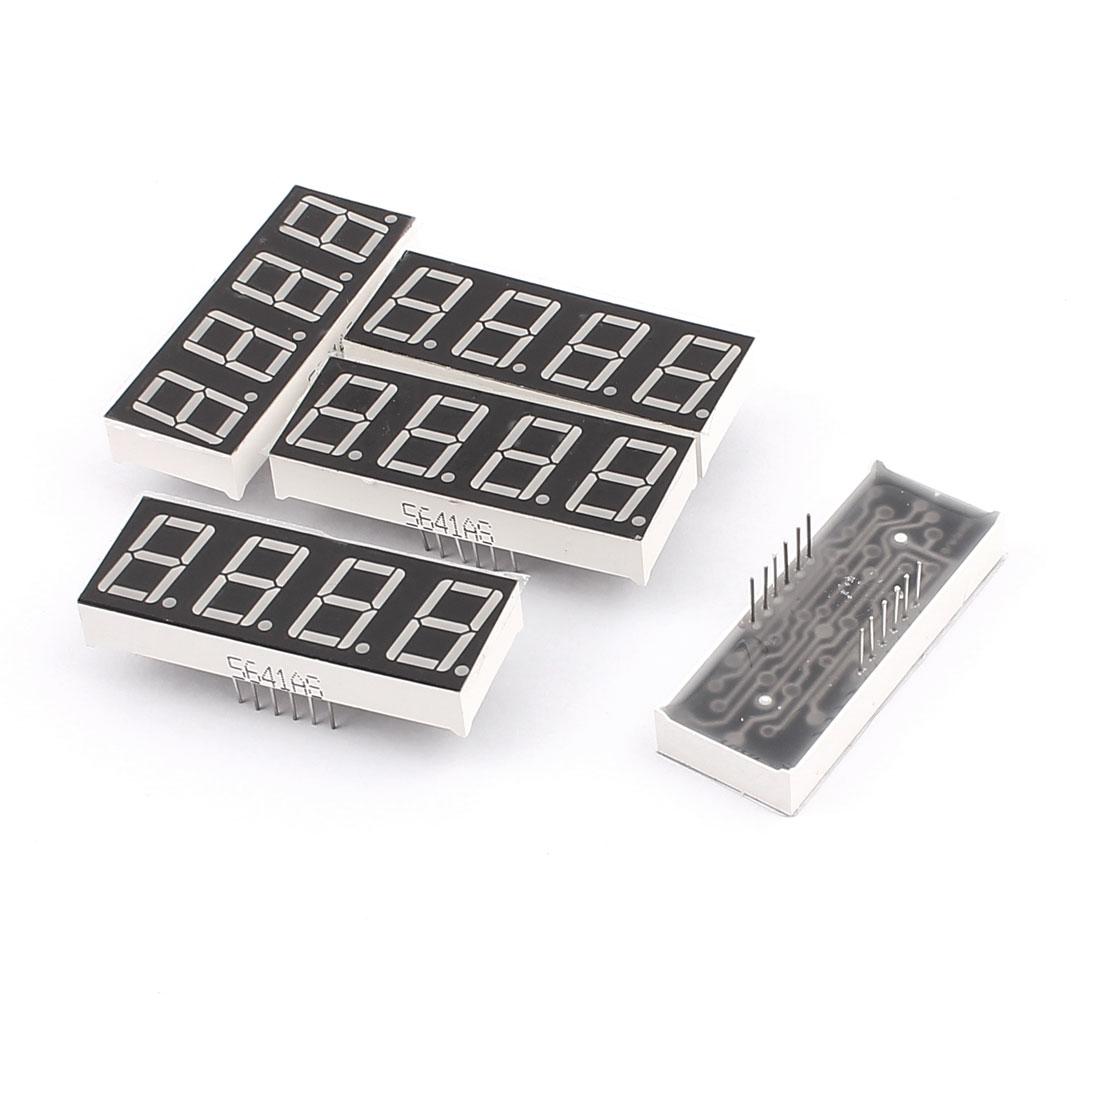 "5 Pcs Common Cathode 12 Pin 4 Bit 7 Segment 0.56"" Red LED Display Digital Tube"